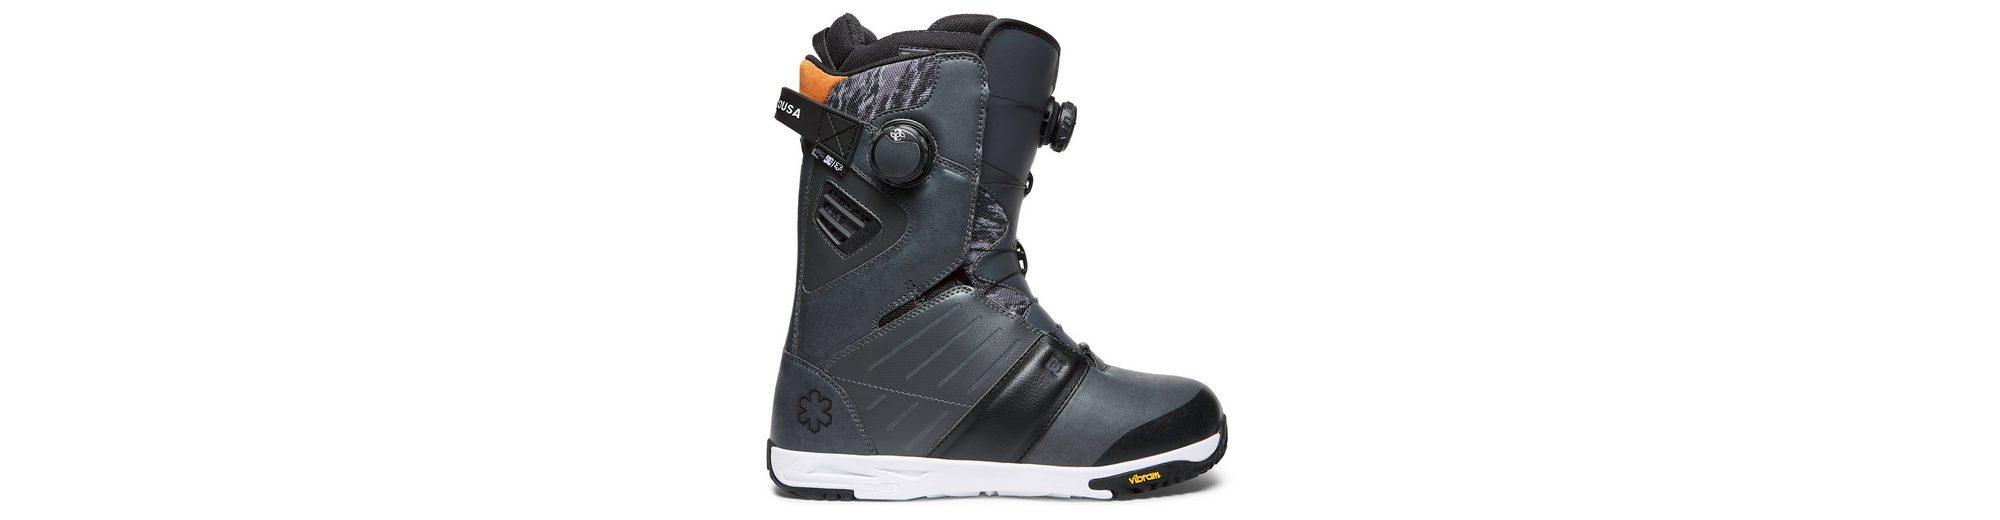 DC Shoes BOA Snowboard-Boots Judge